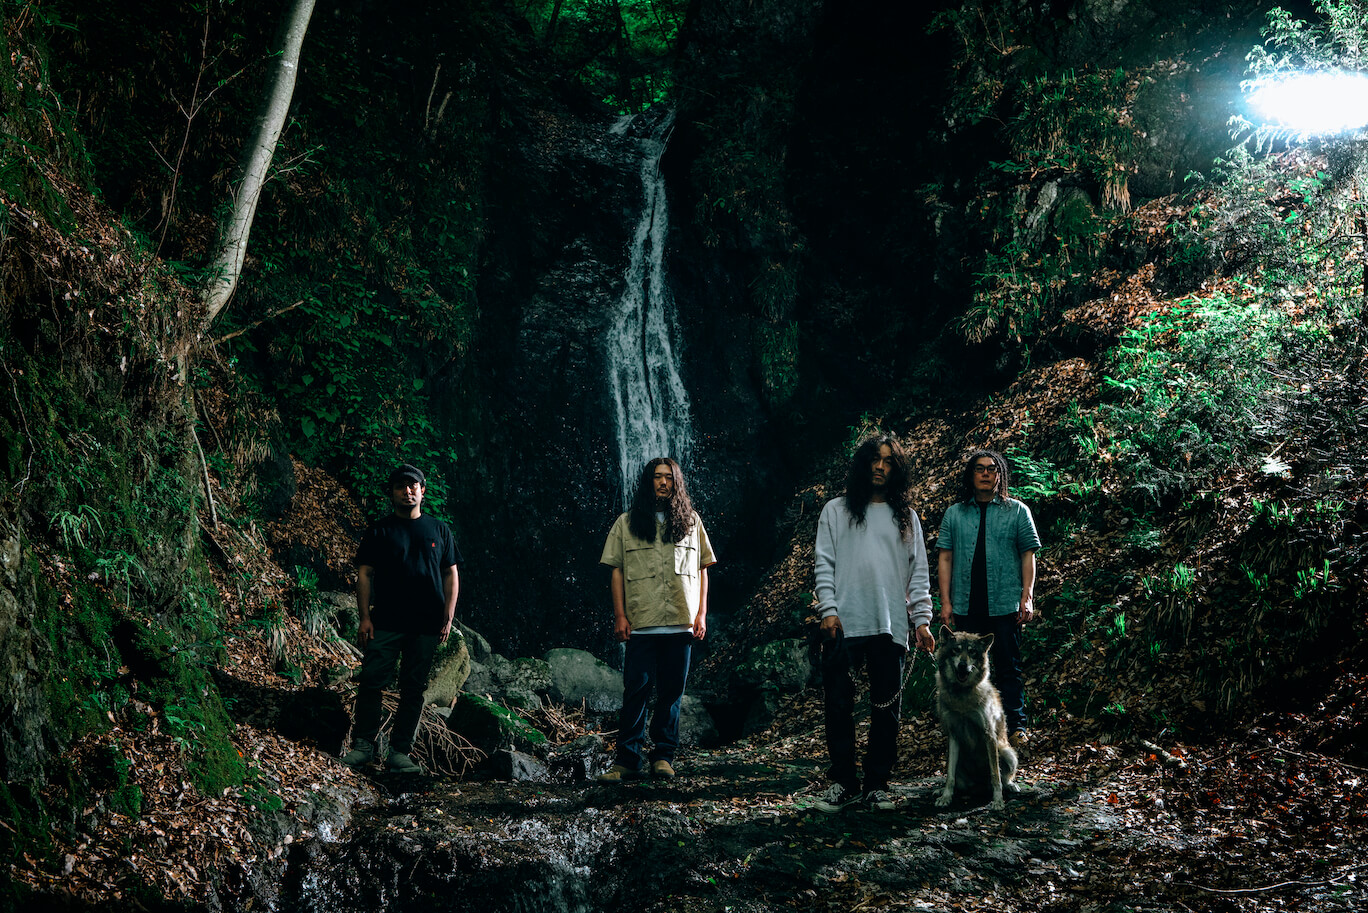 G-FREAK FACTORY、アルバム収録曲「ヴィンテージ」のMV公開と先行配信が決定